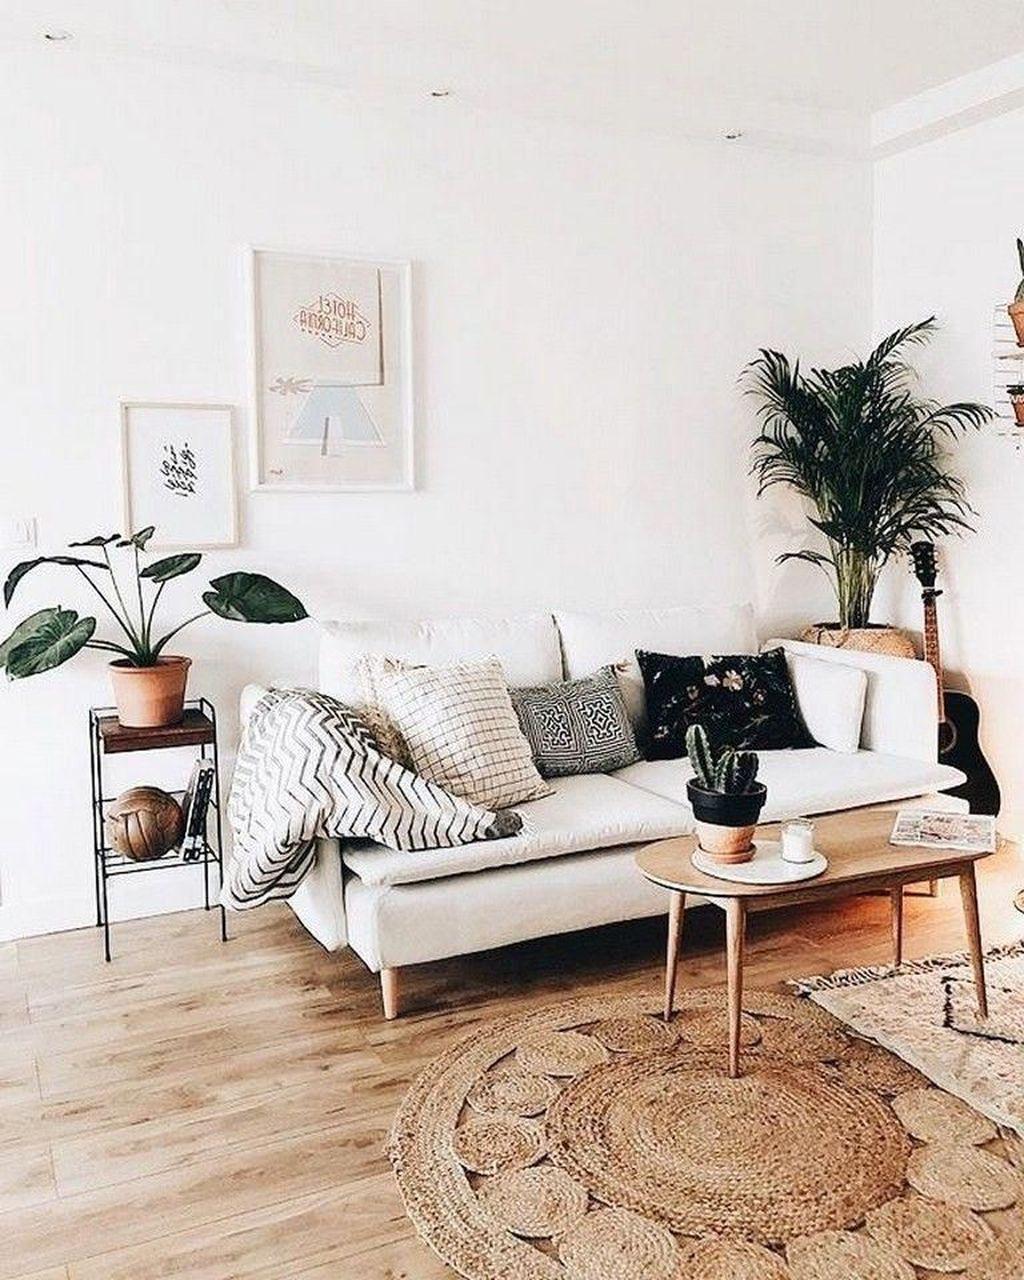 Amazing Bohemian Farmhouse Living Room Design Ideas 15